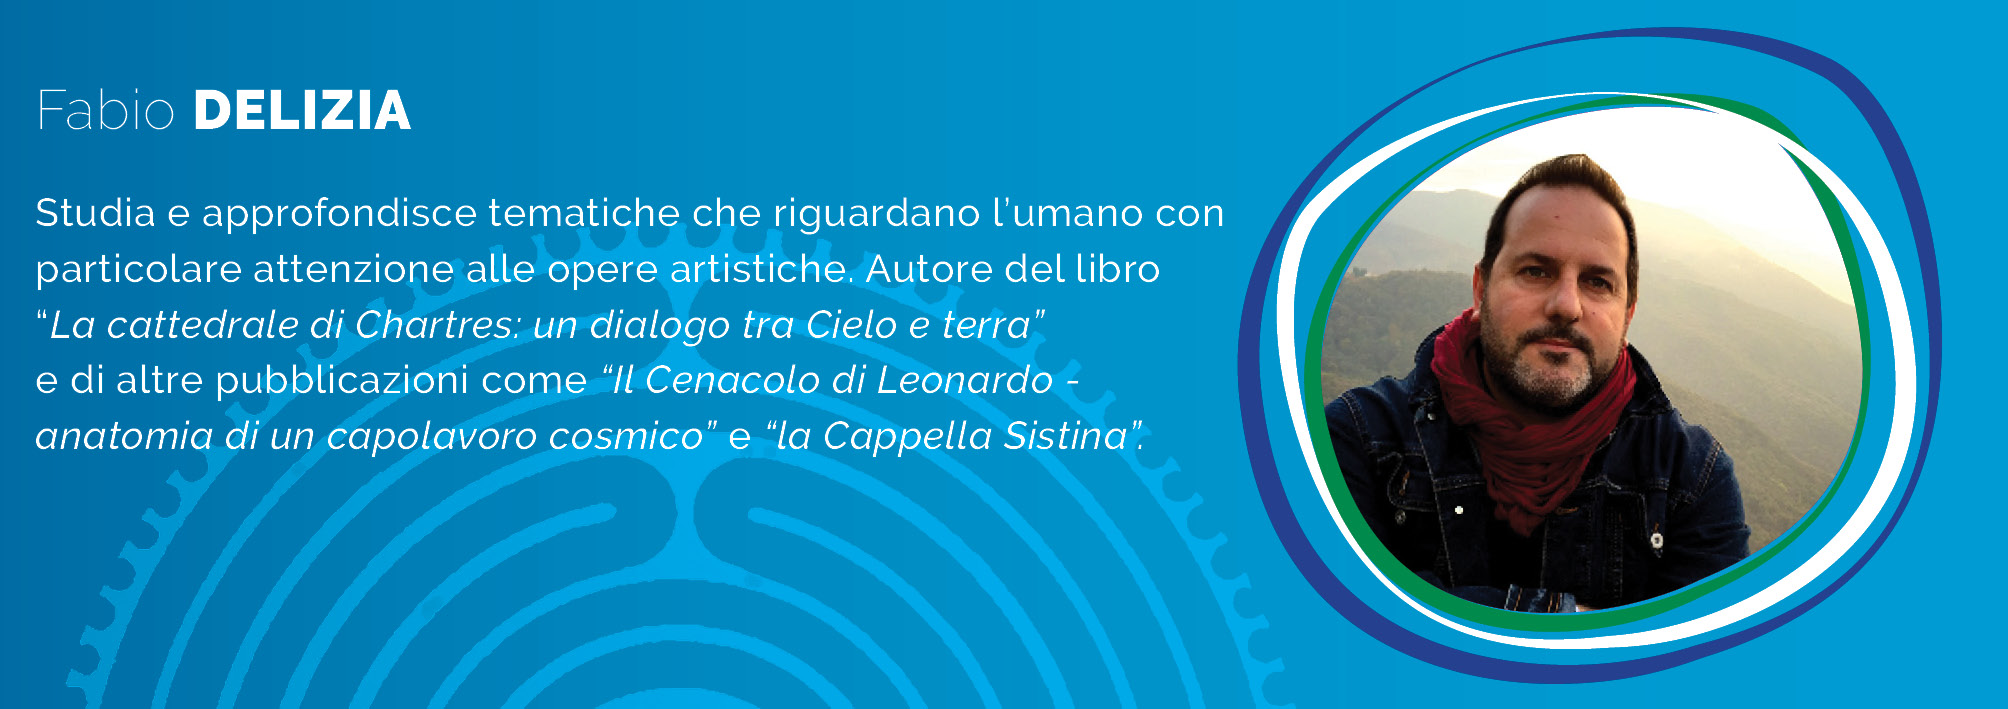 Fabio Delizia - biografia